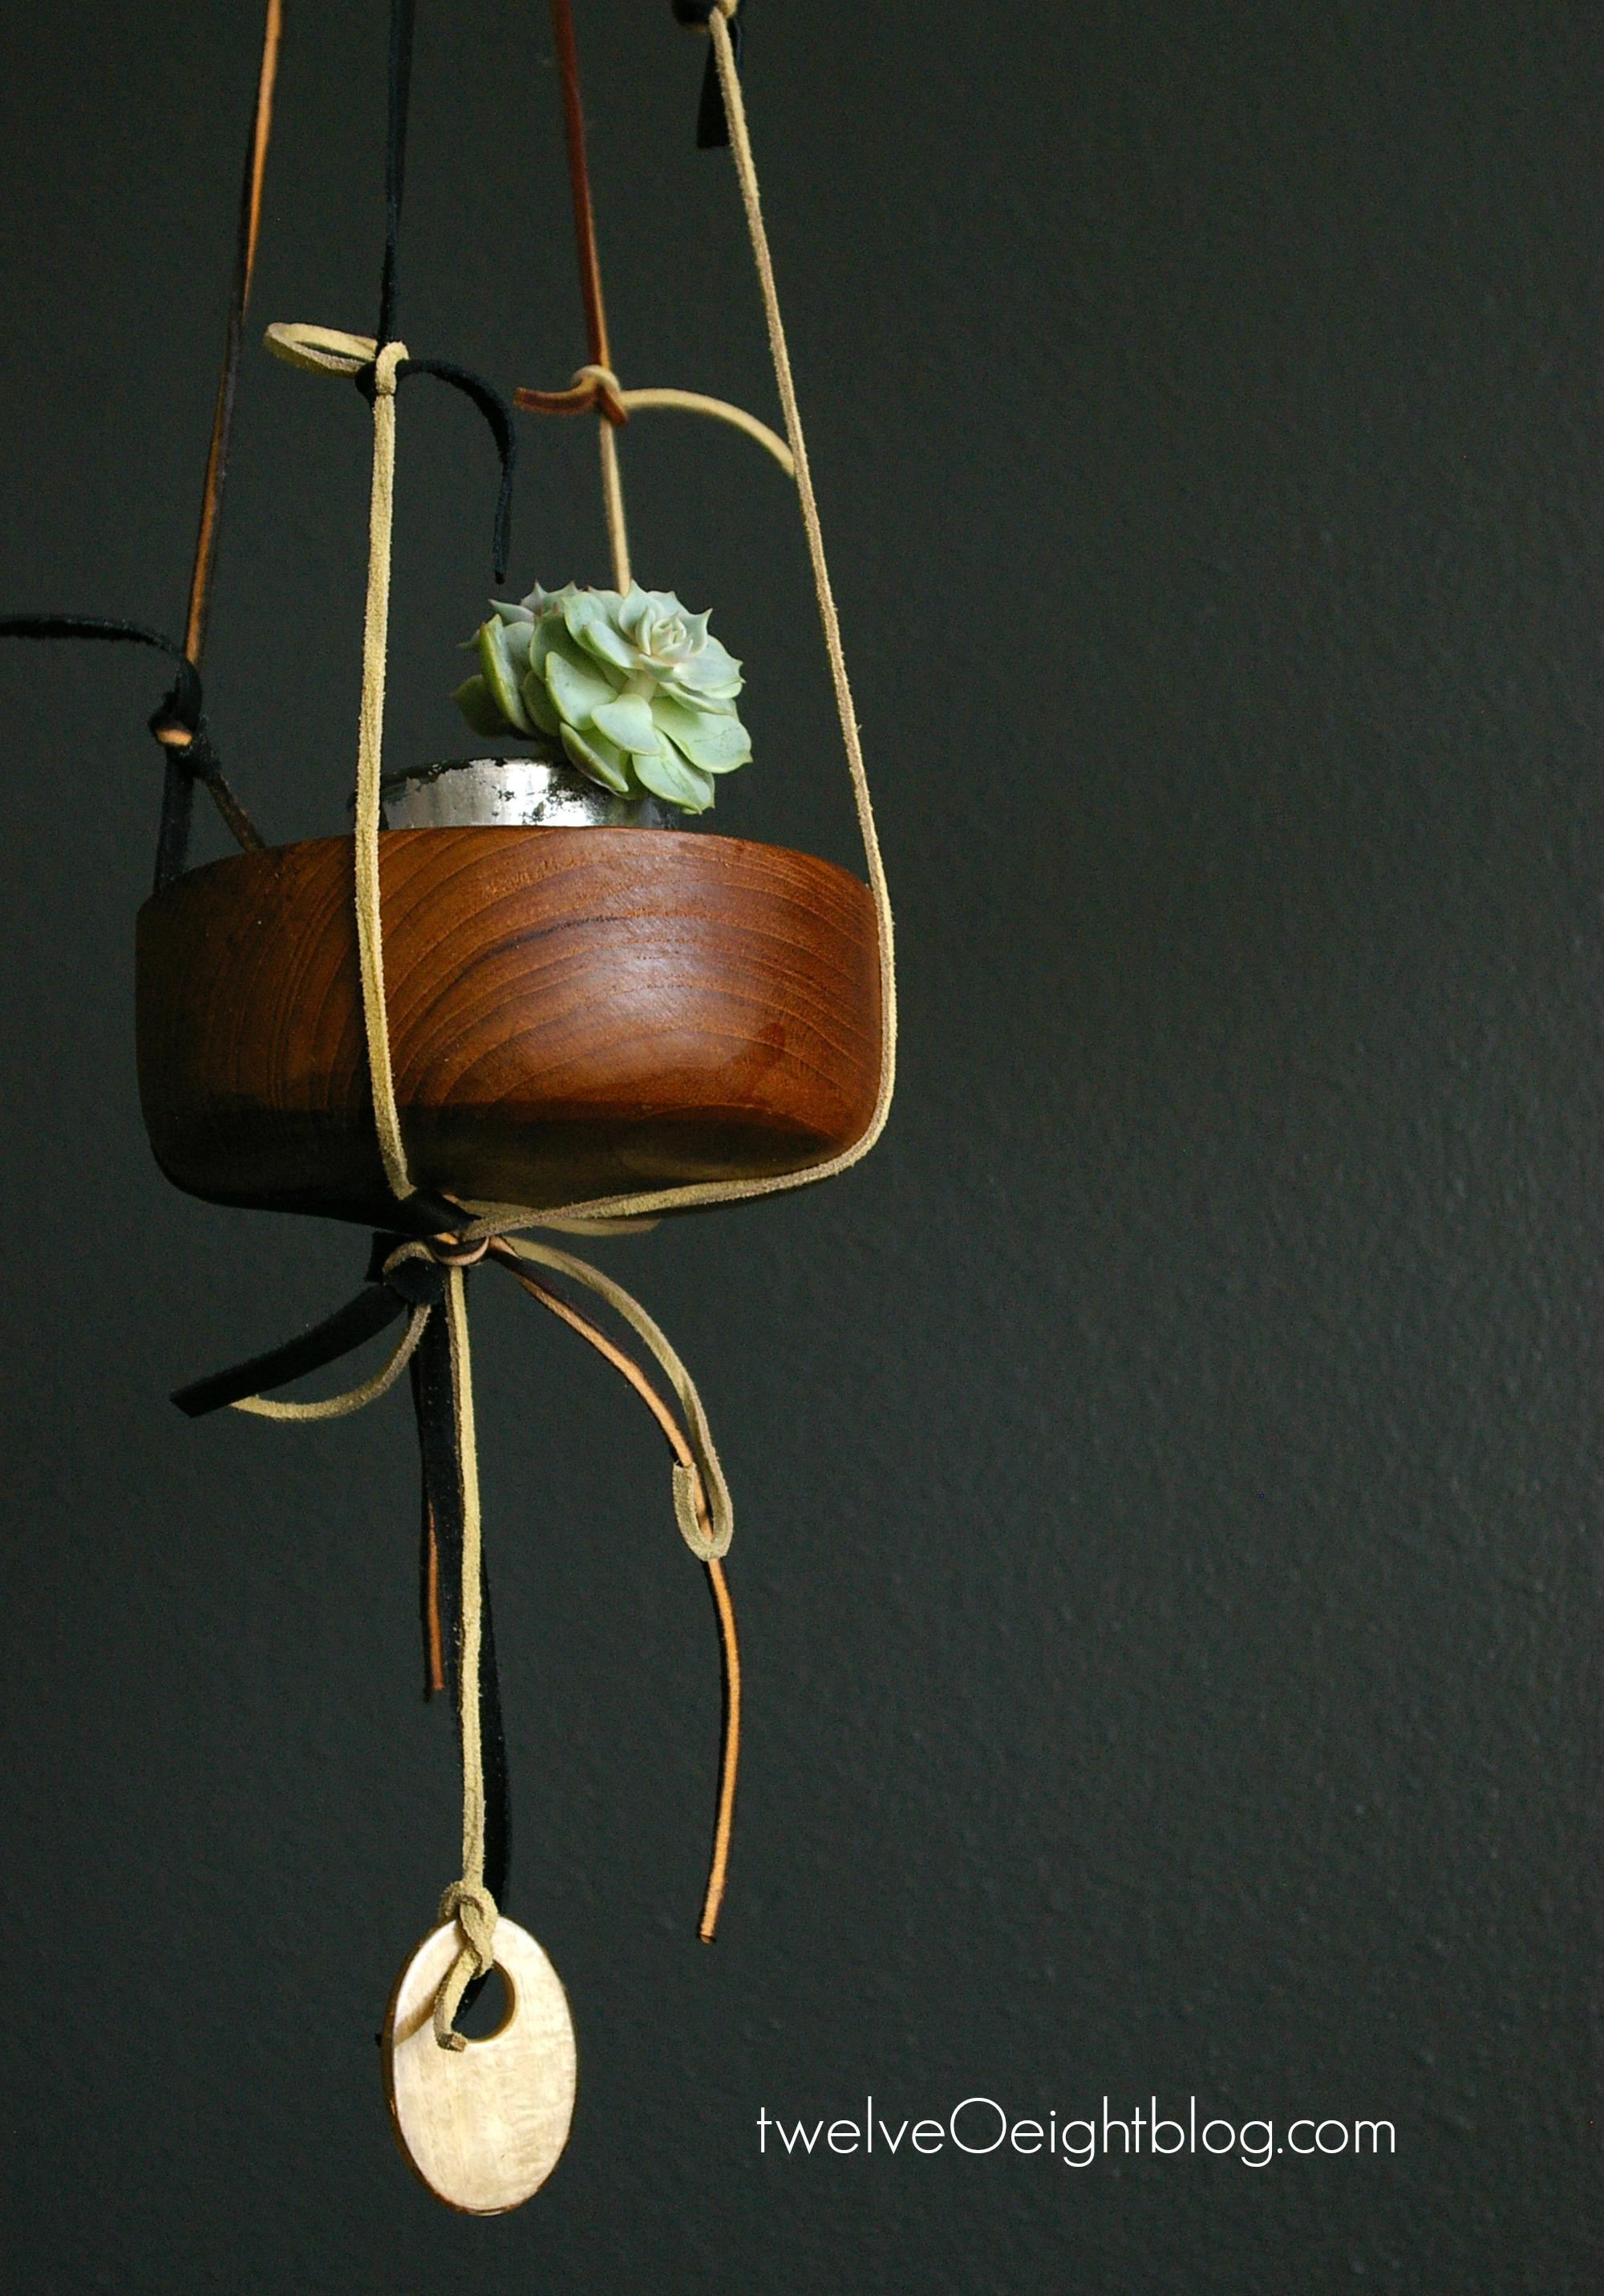 Leather and Wood Planter twelveOeightblog.com #diy #leathercraft #wood ...